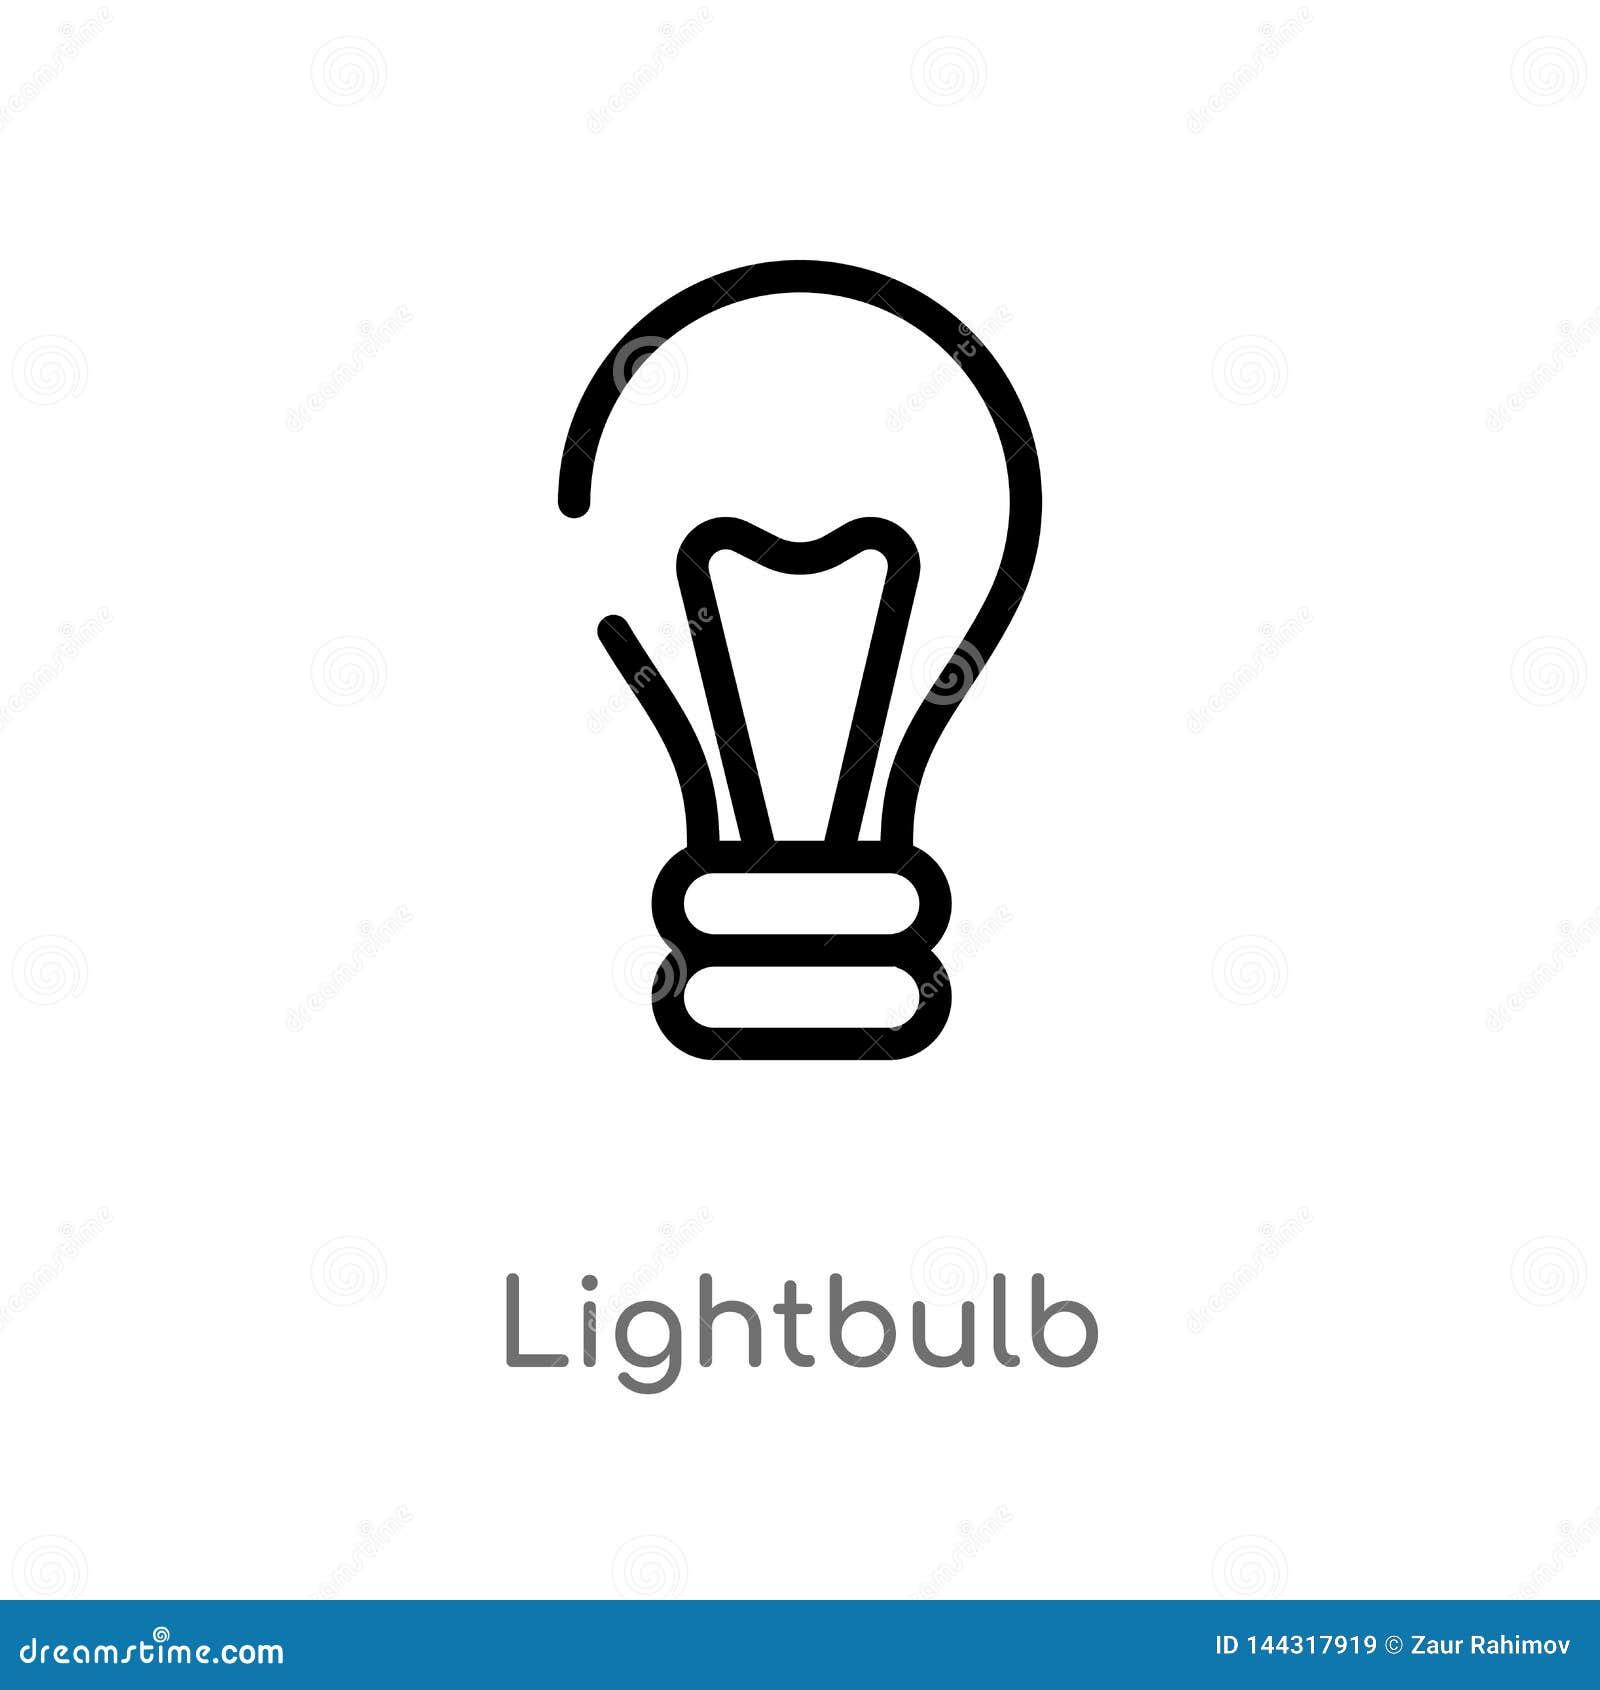 outline lightbulb vector icon. isolated black simple line element illustration from smart house concept. editable vector stroke